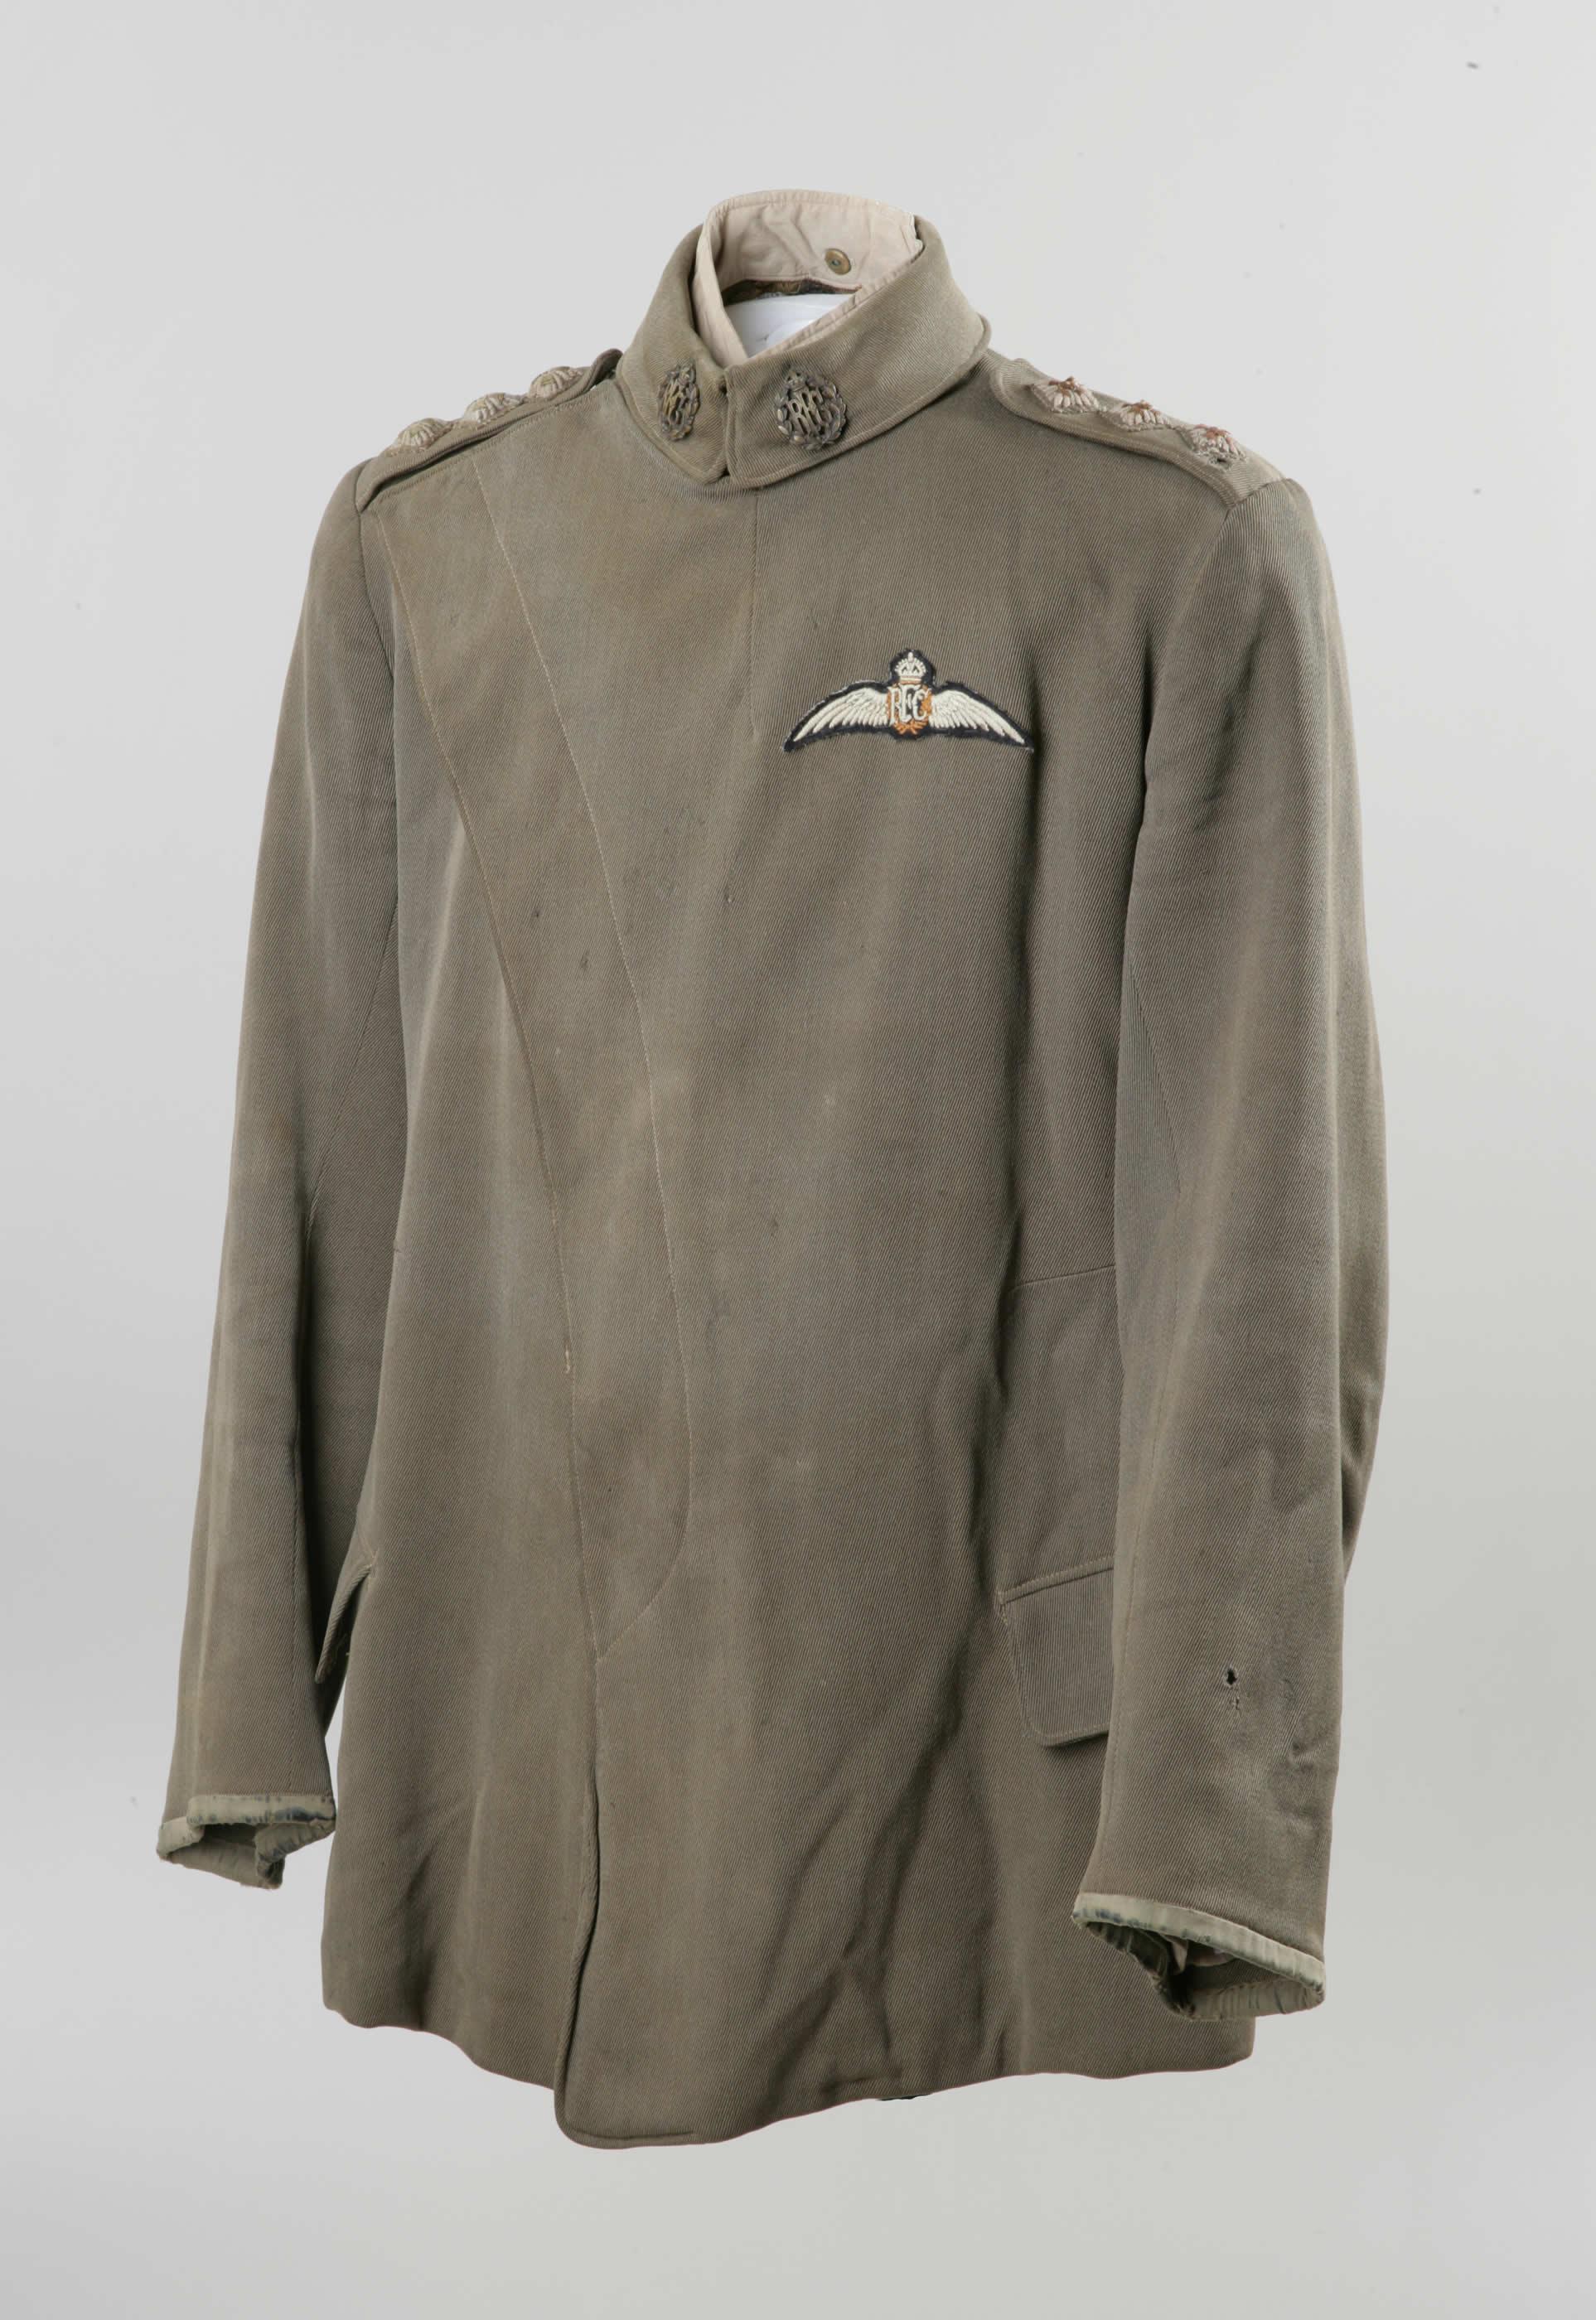 Officer's Service Dress Jacket